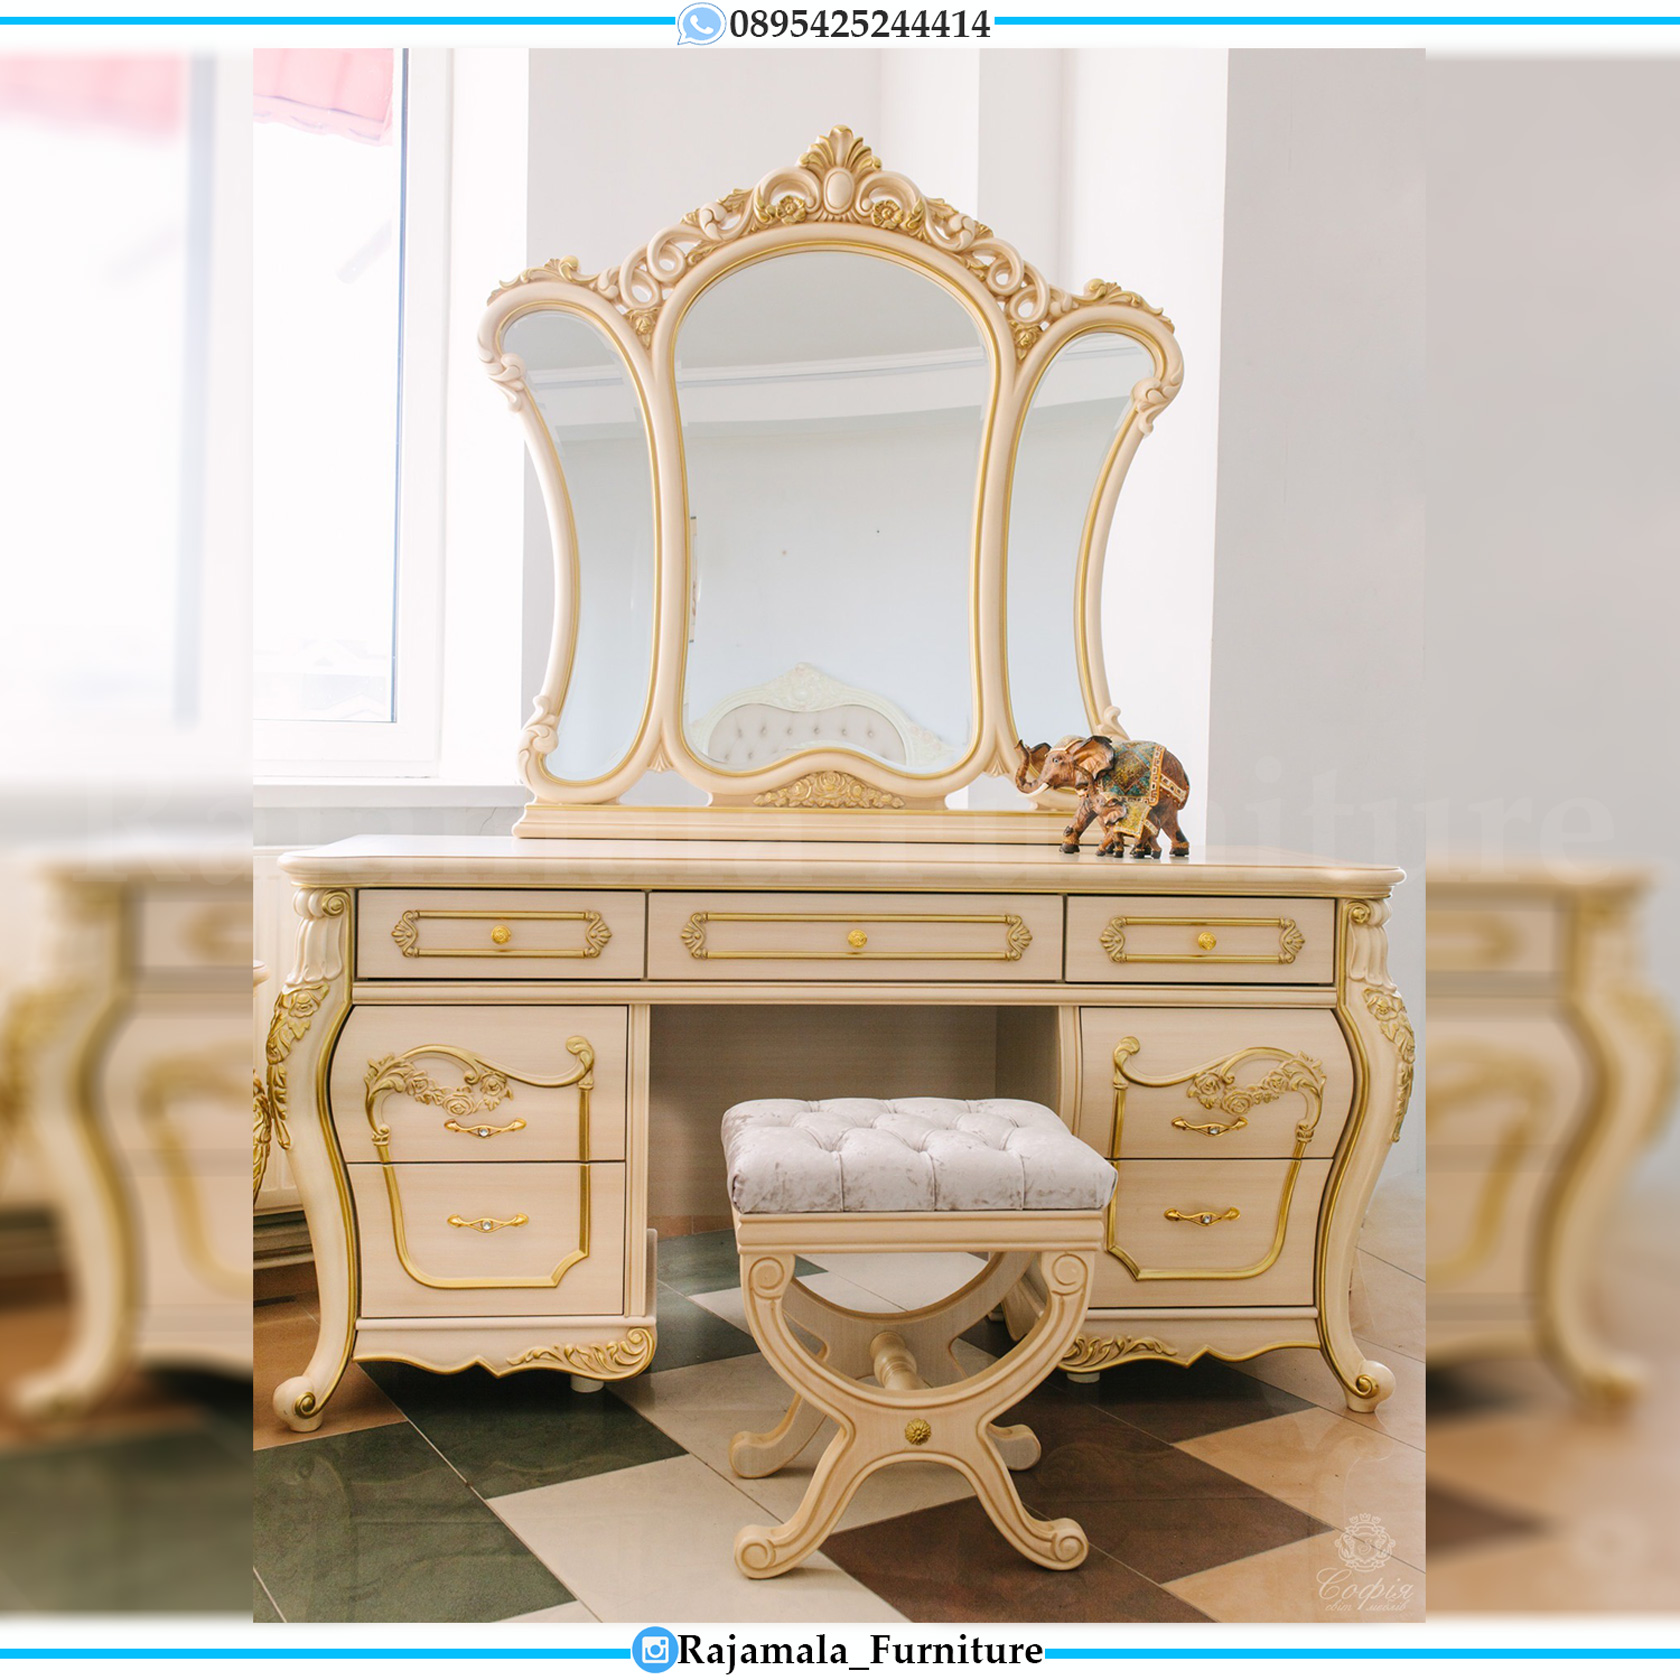 Harga Meja Rias Mewah Jepara Beauty Vanity Room Set RM-0046